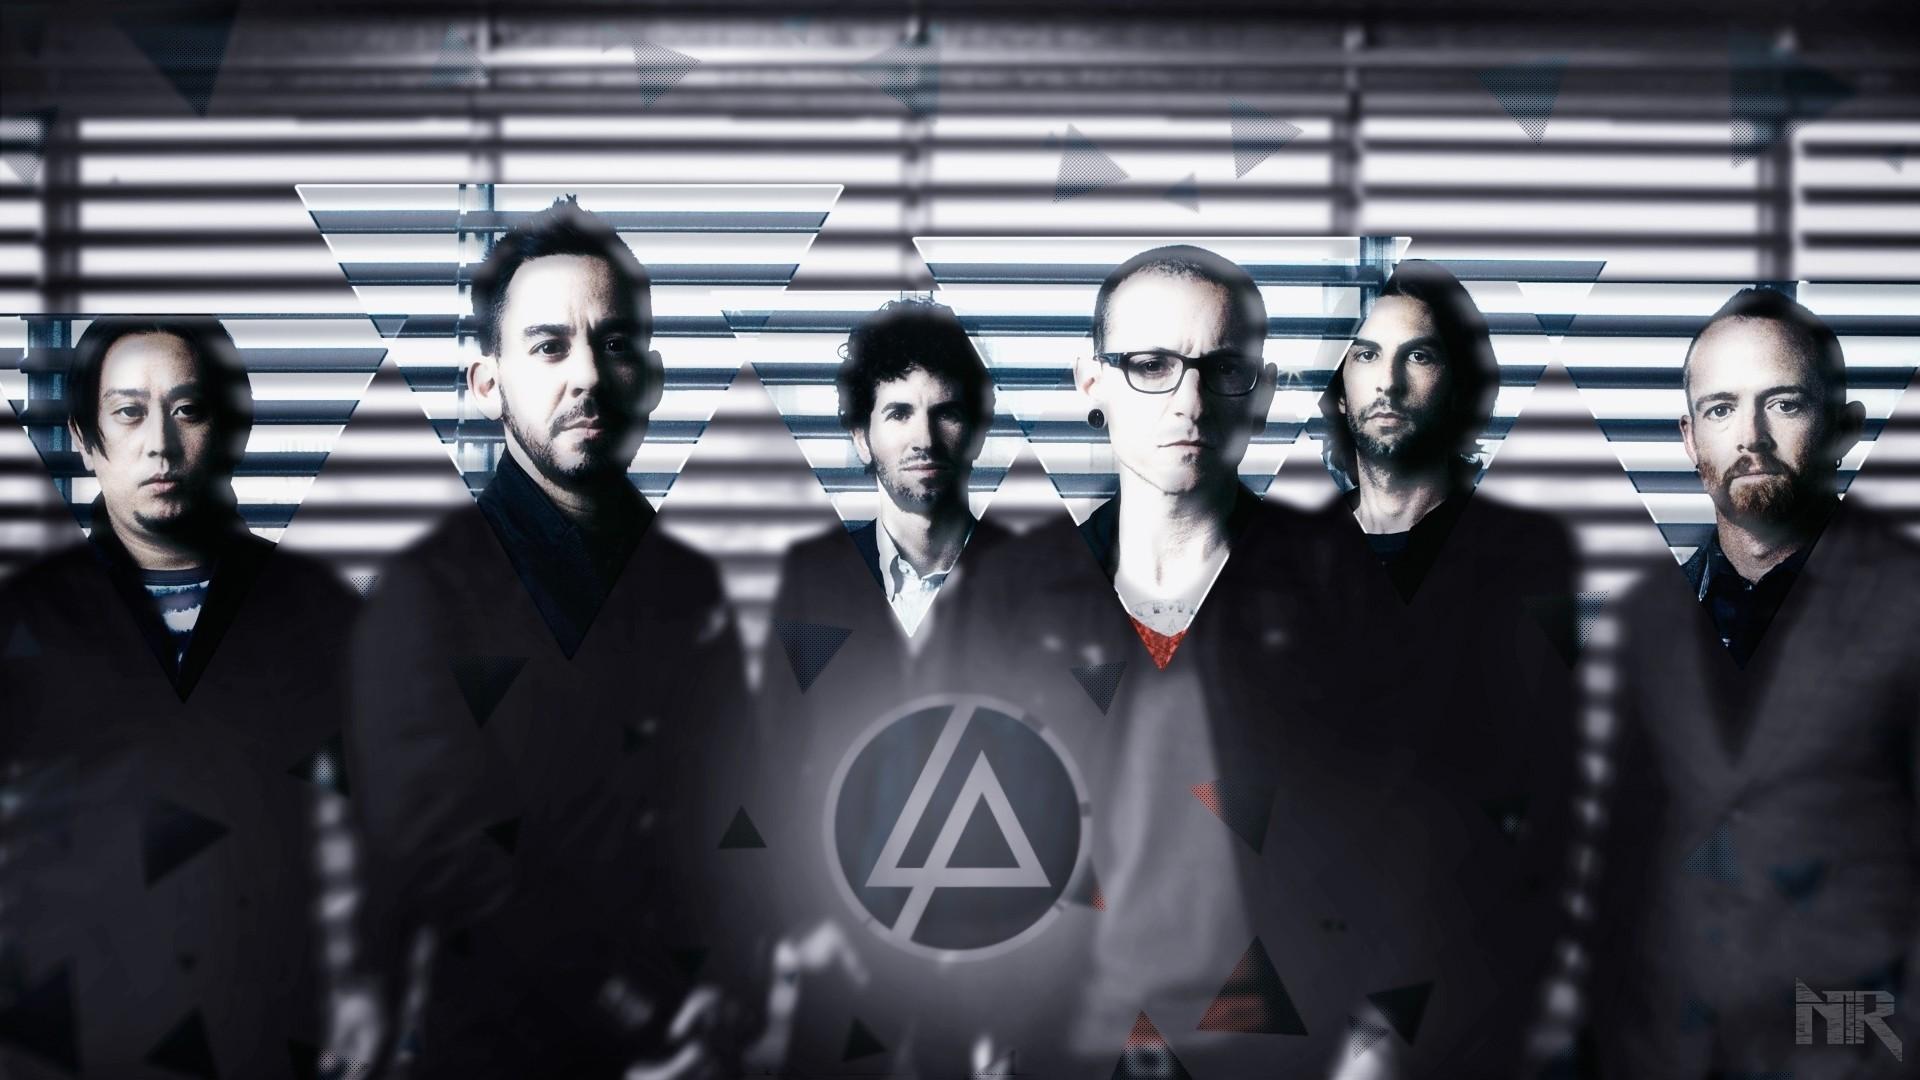 Linkin Park Wallpaper Pic